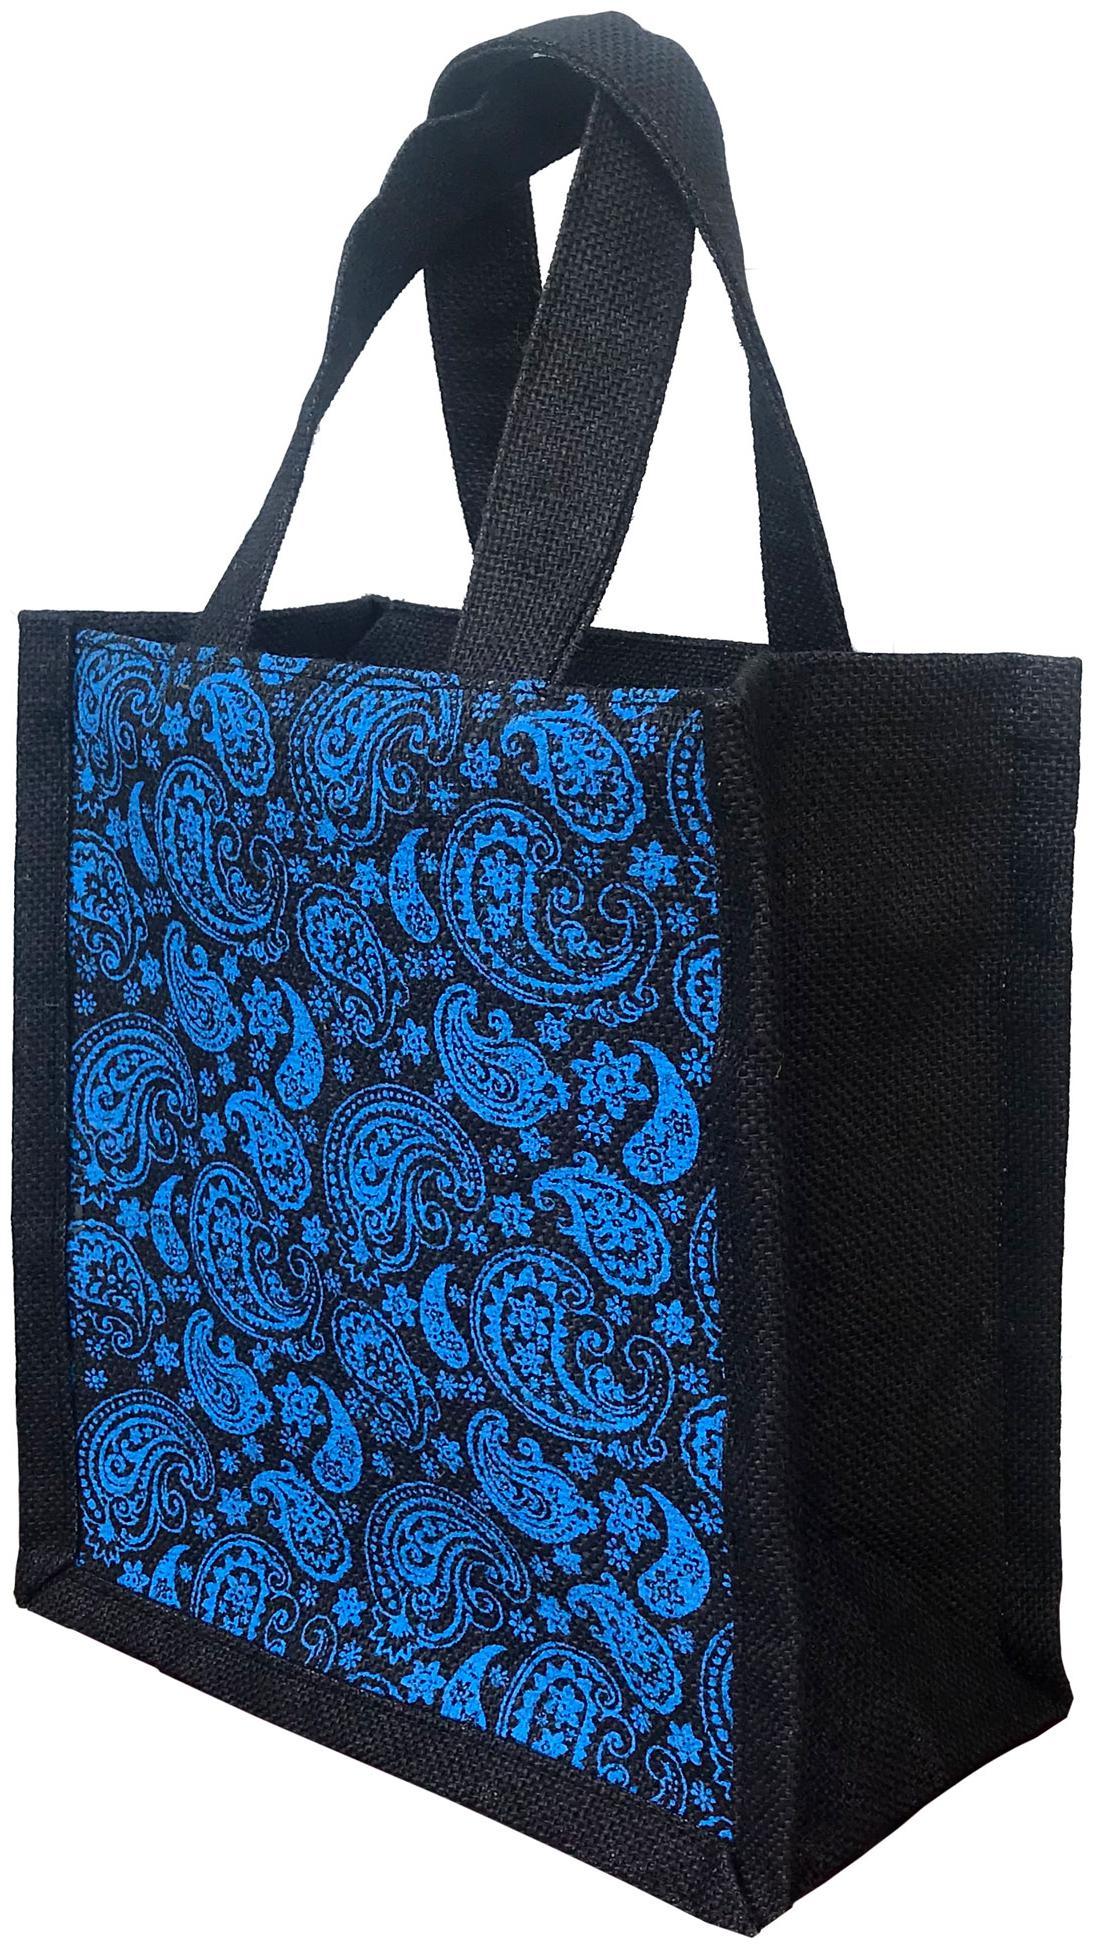 Foonty Jute Solid Tote Bag For Women